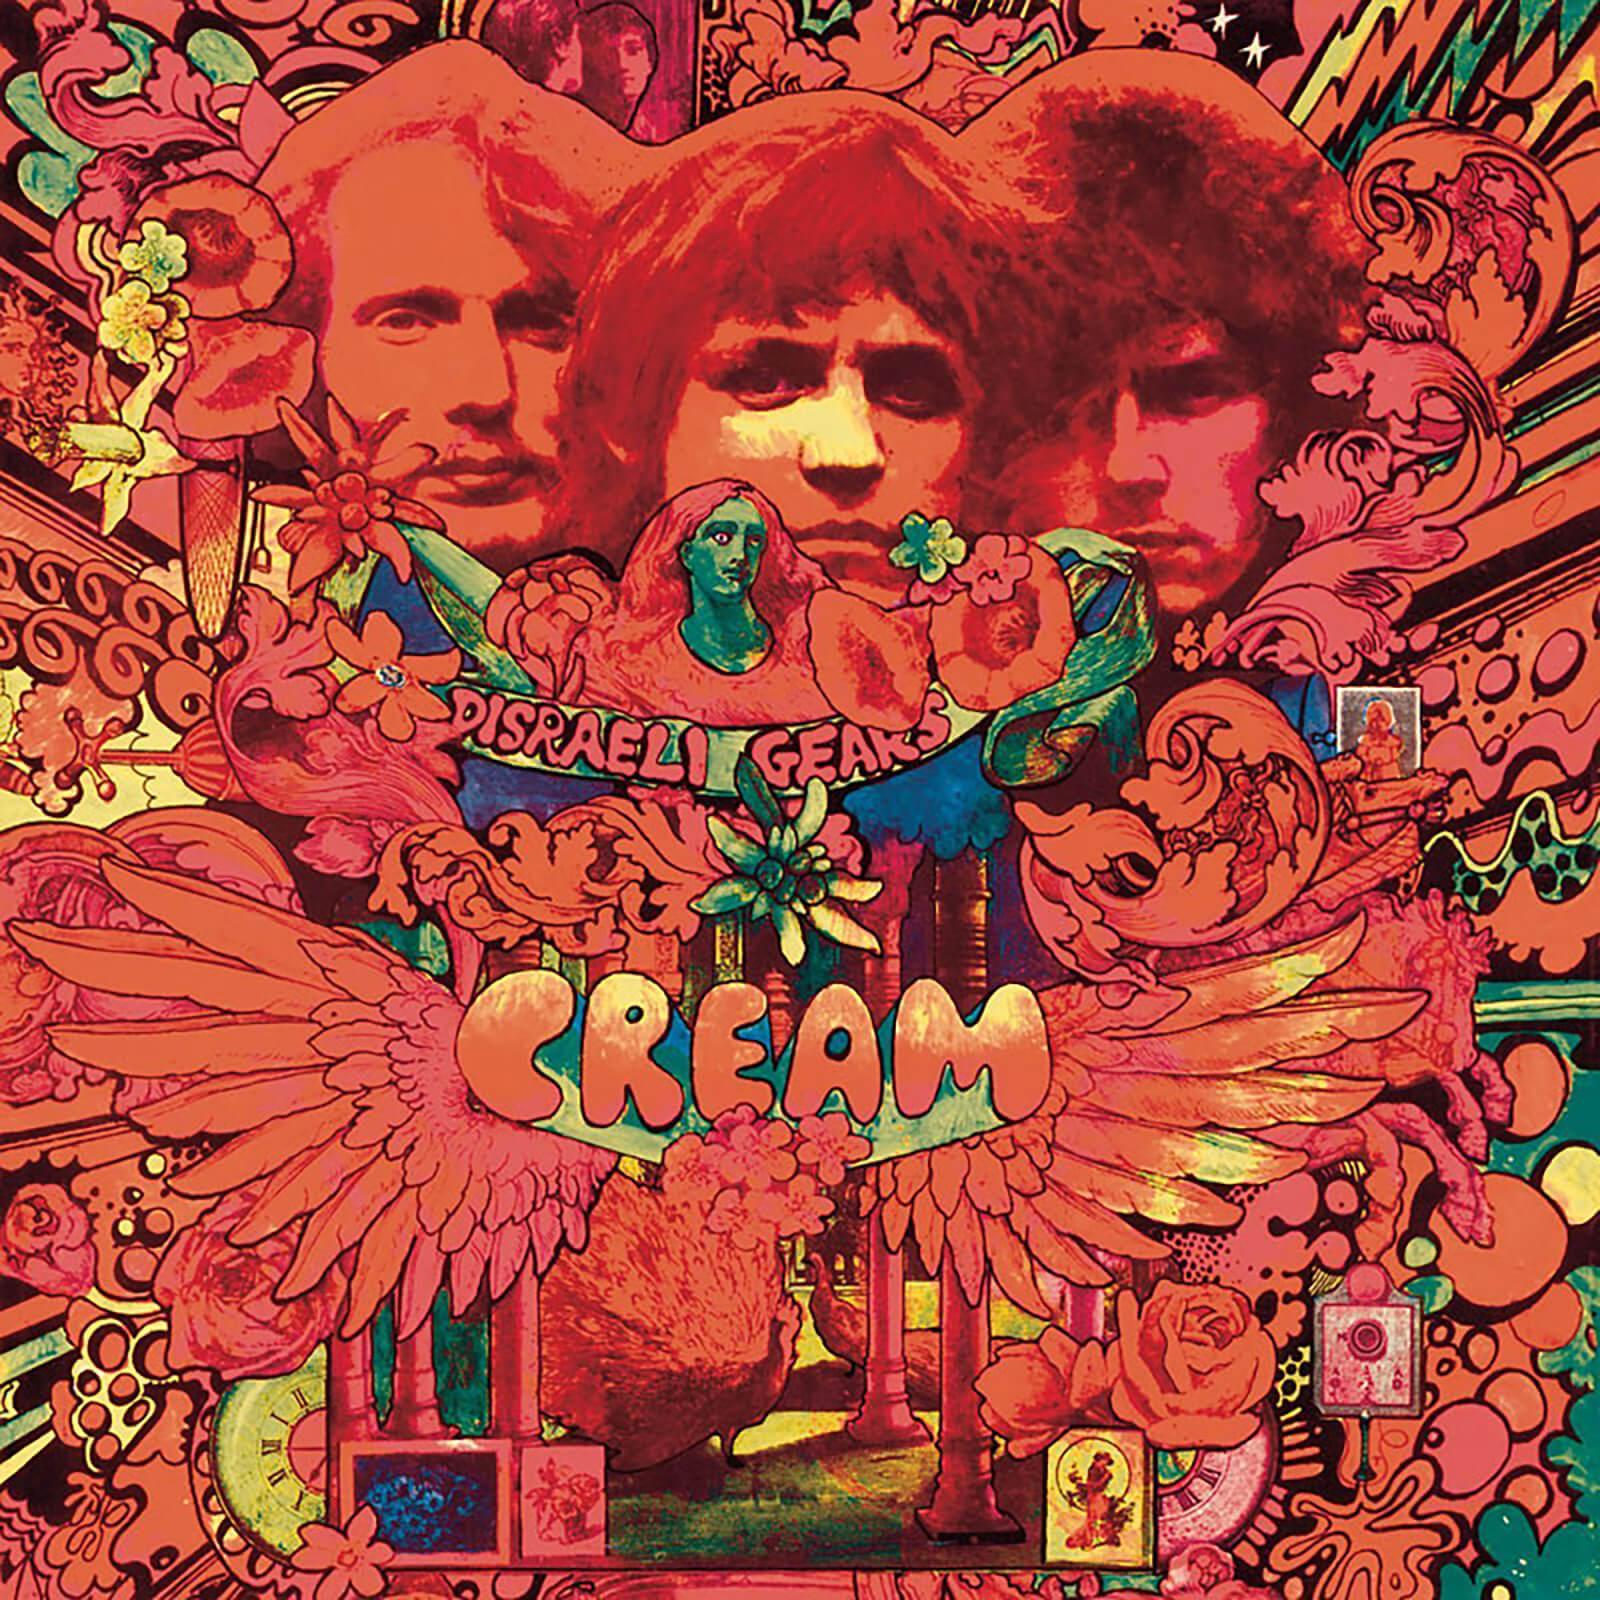 UMC Polydo Cream - Disraeli Gears 12 Inch LP